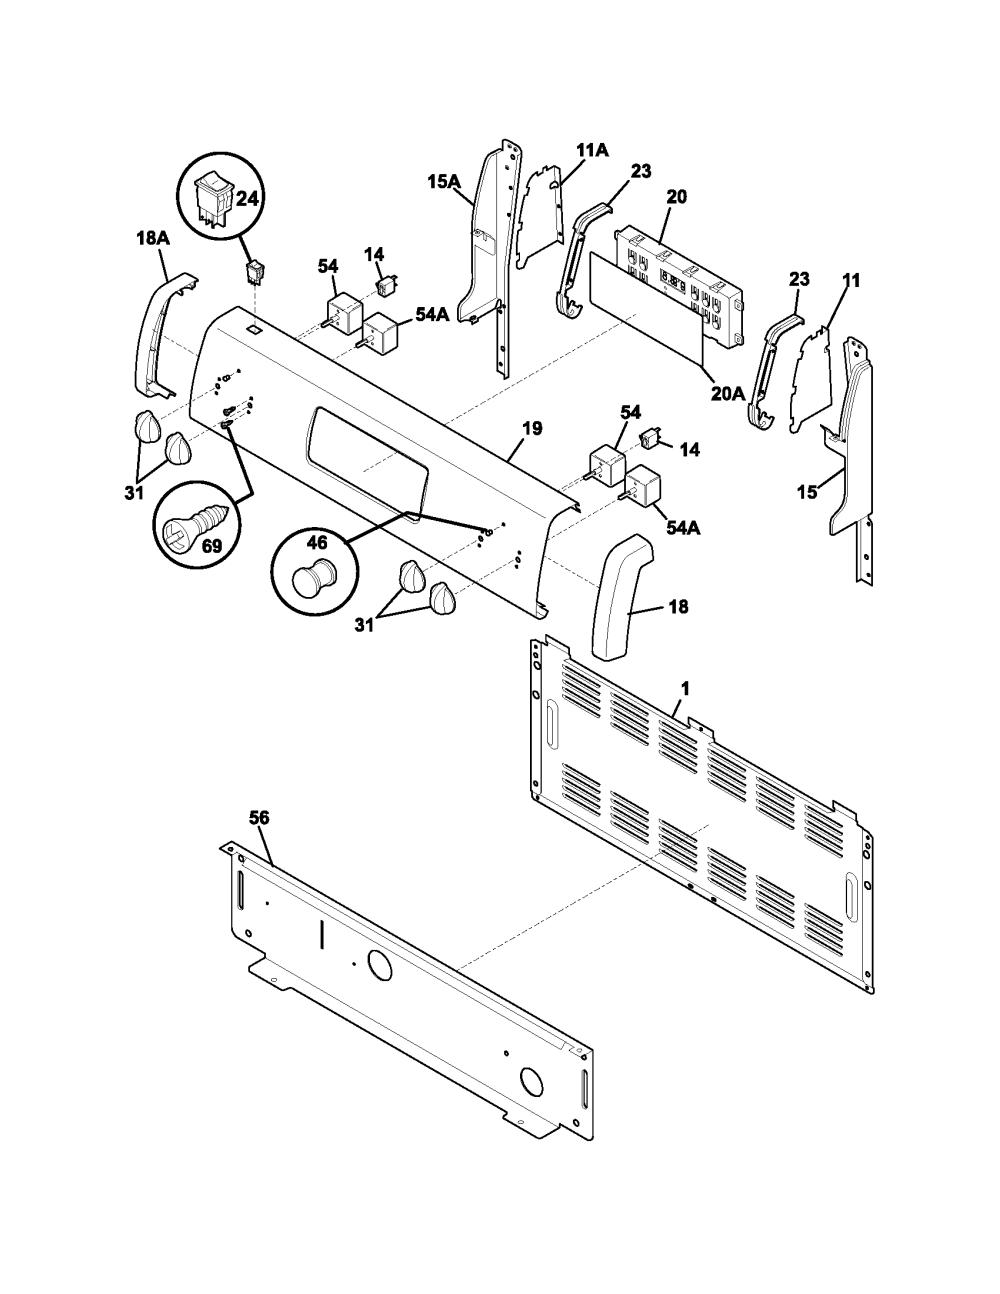 medium resolution of fef352aug electric range backguard parts diagram